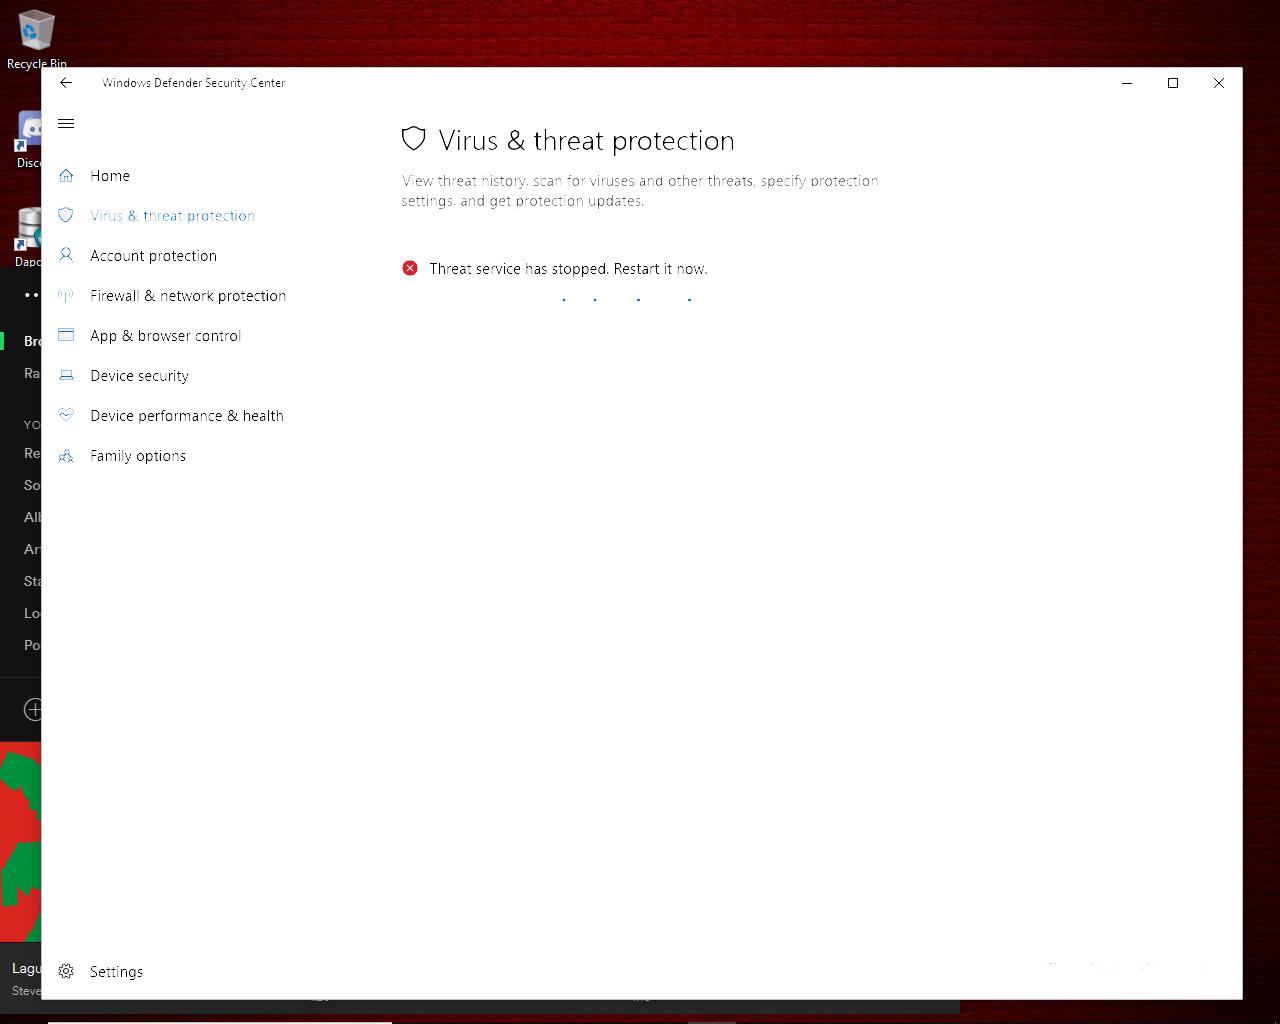 Windows Defender - Threat service has stopped - Microsoft Community